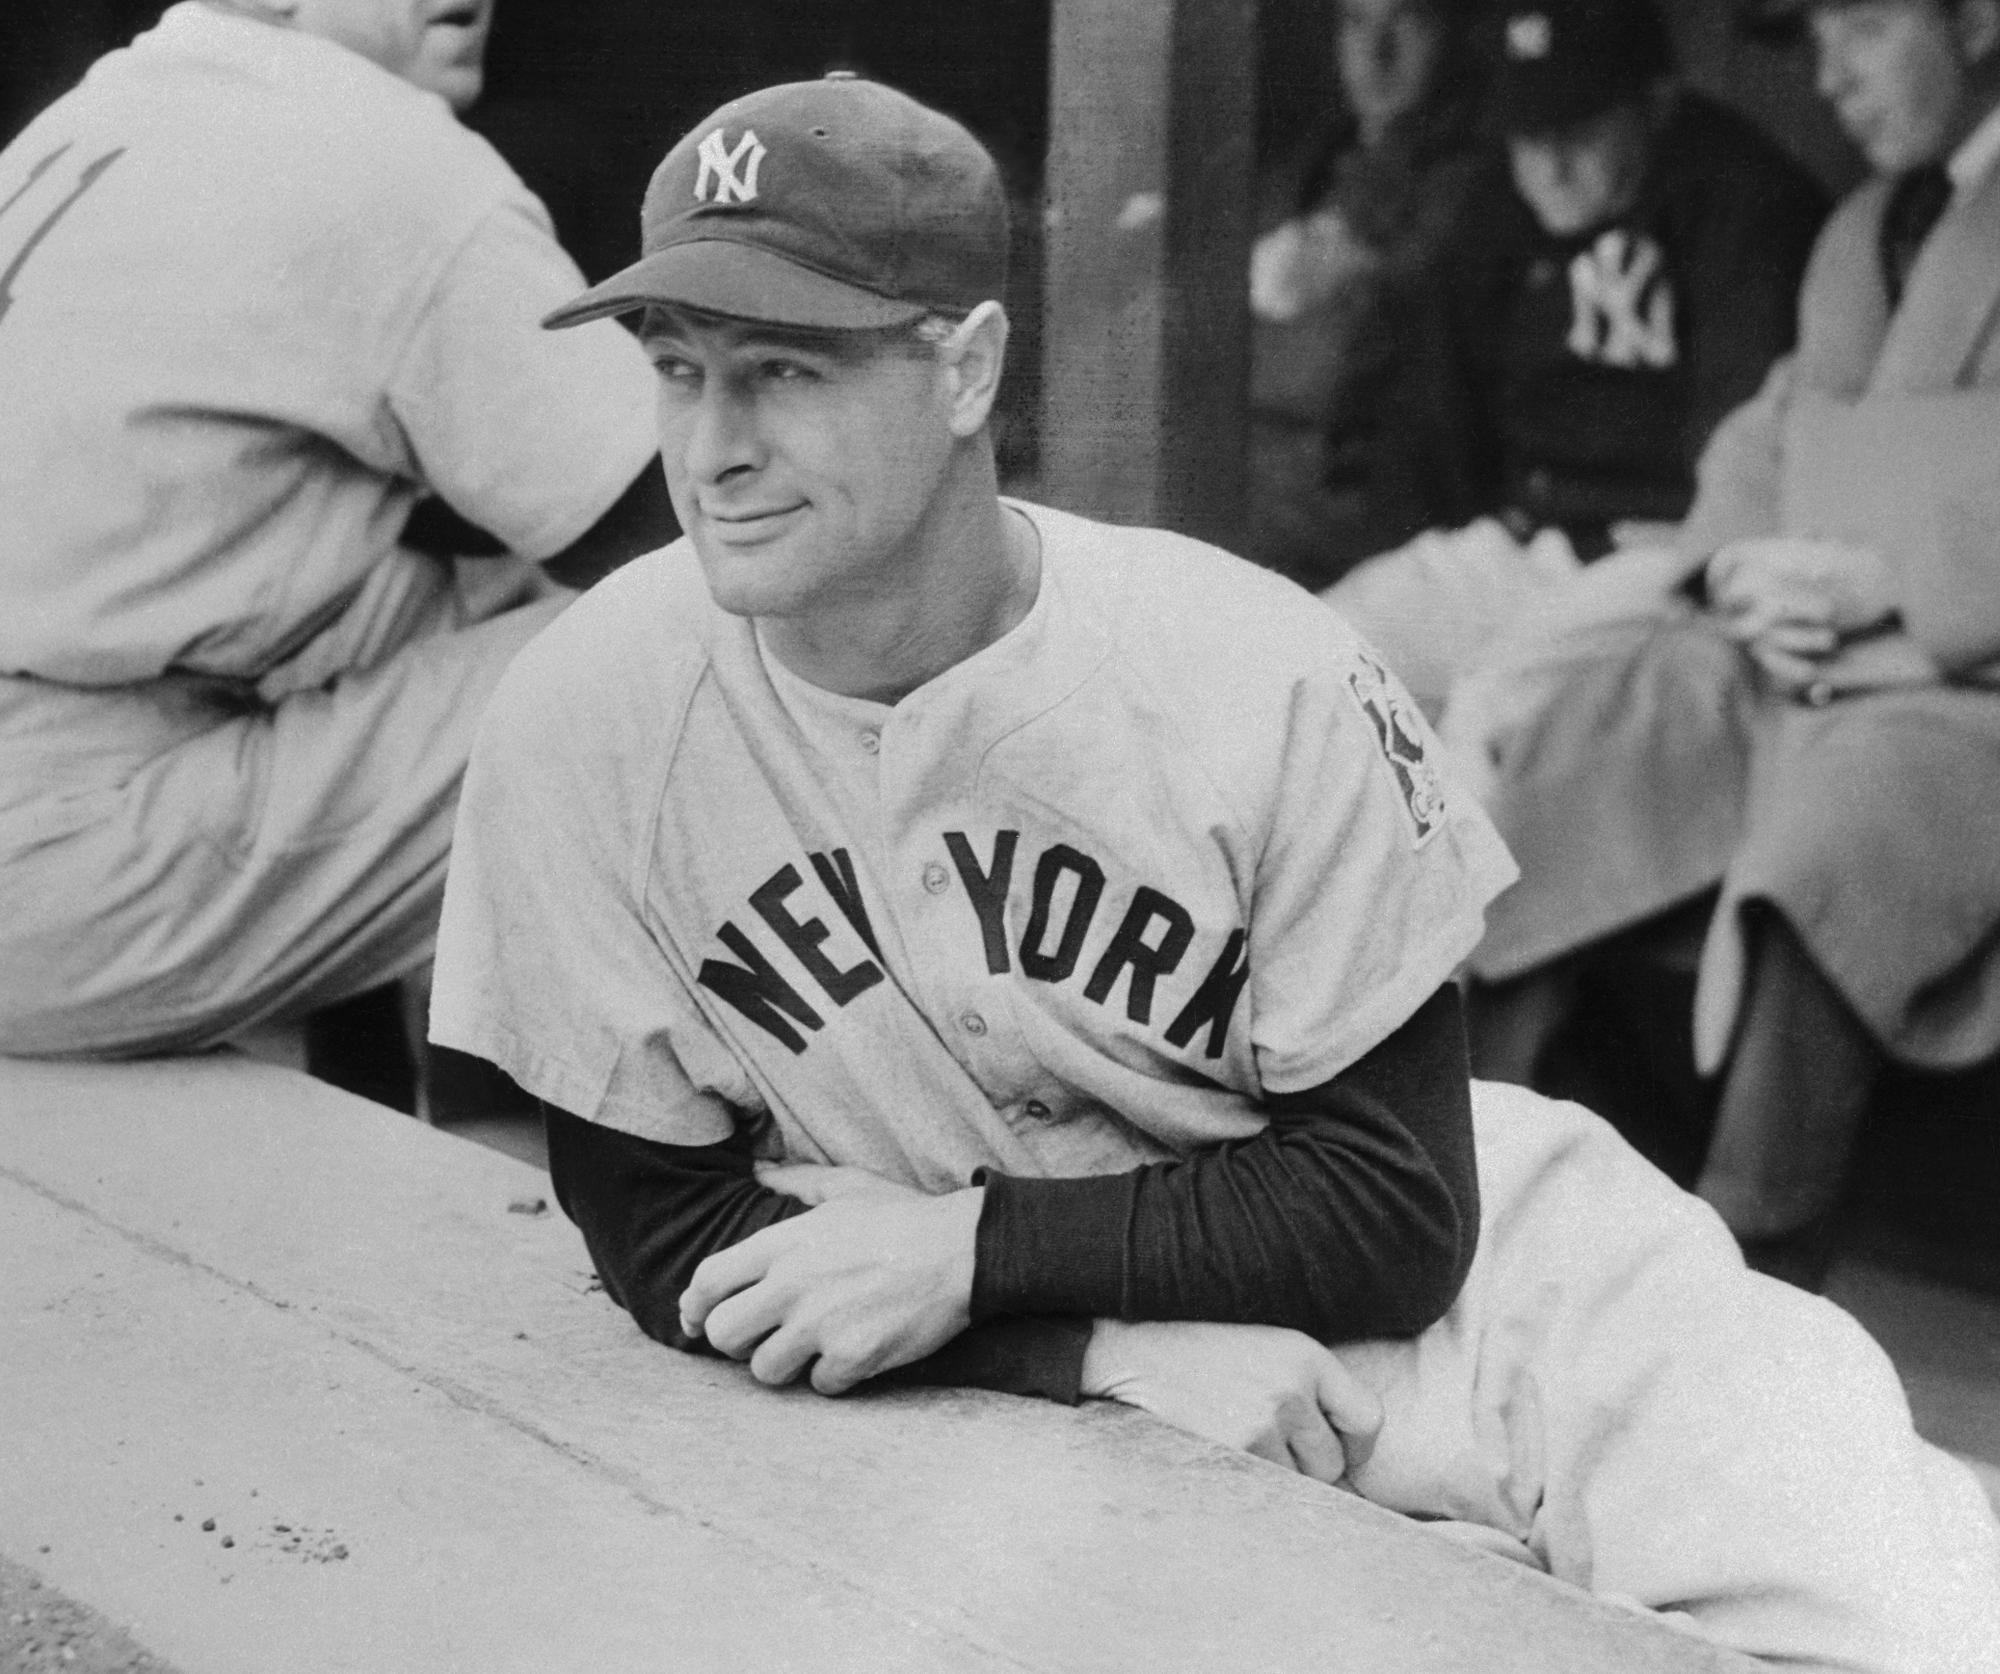 Stop & Shop deal, pot's high risk on roads, Lou Gehrig's $312K cap